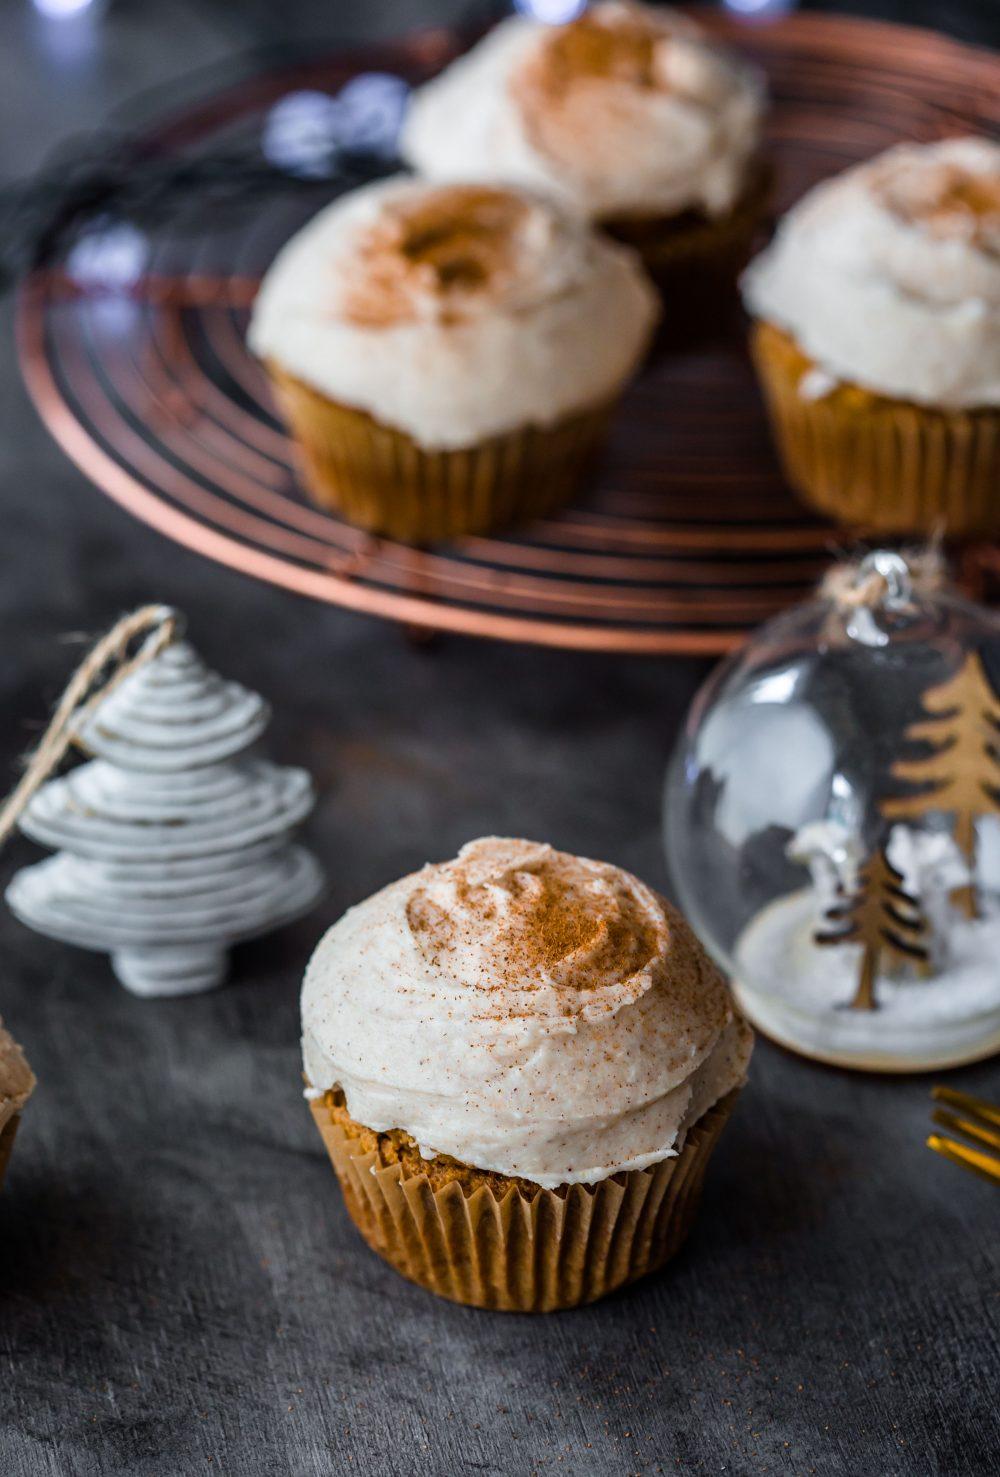 chai-cupcakes-gluten-free-christmas-cupcakes-frosting-holidays-baking-cardamon